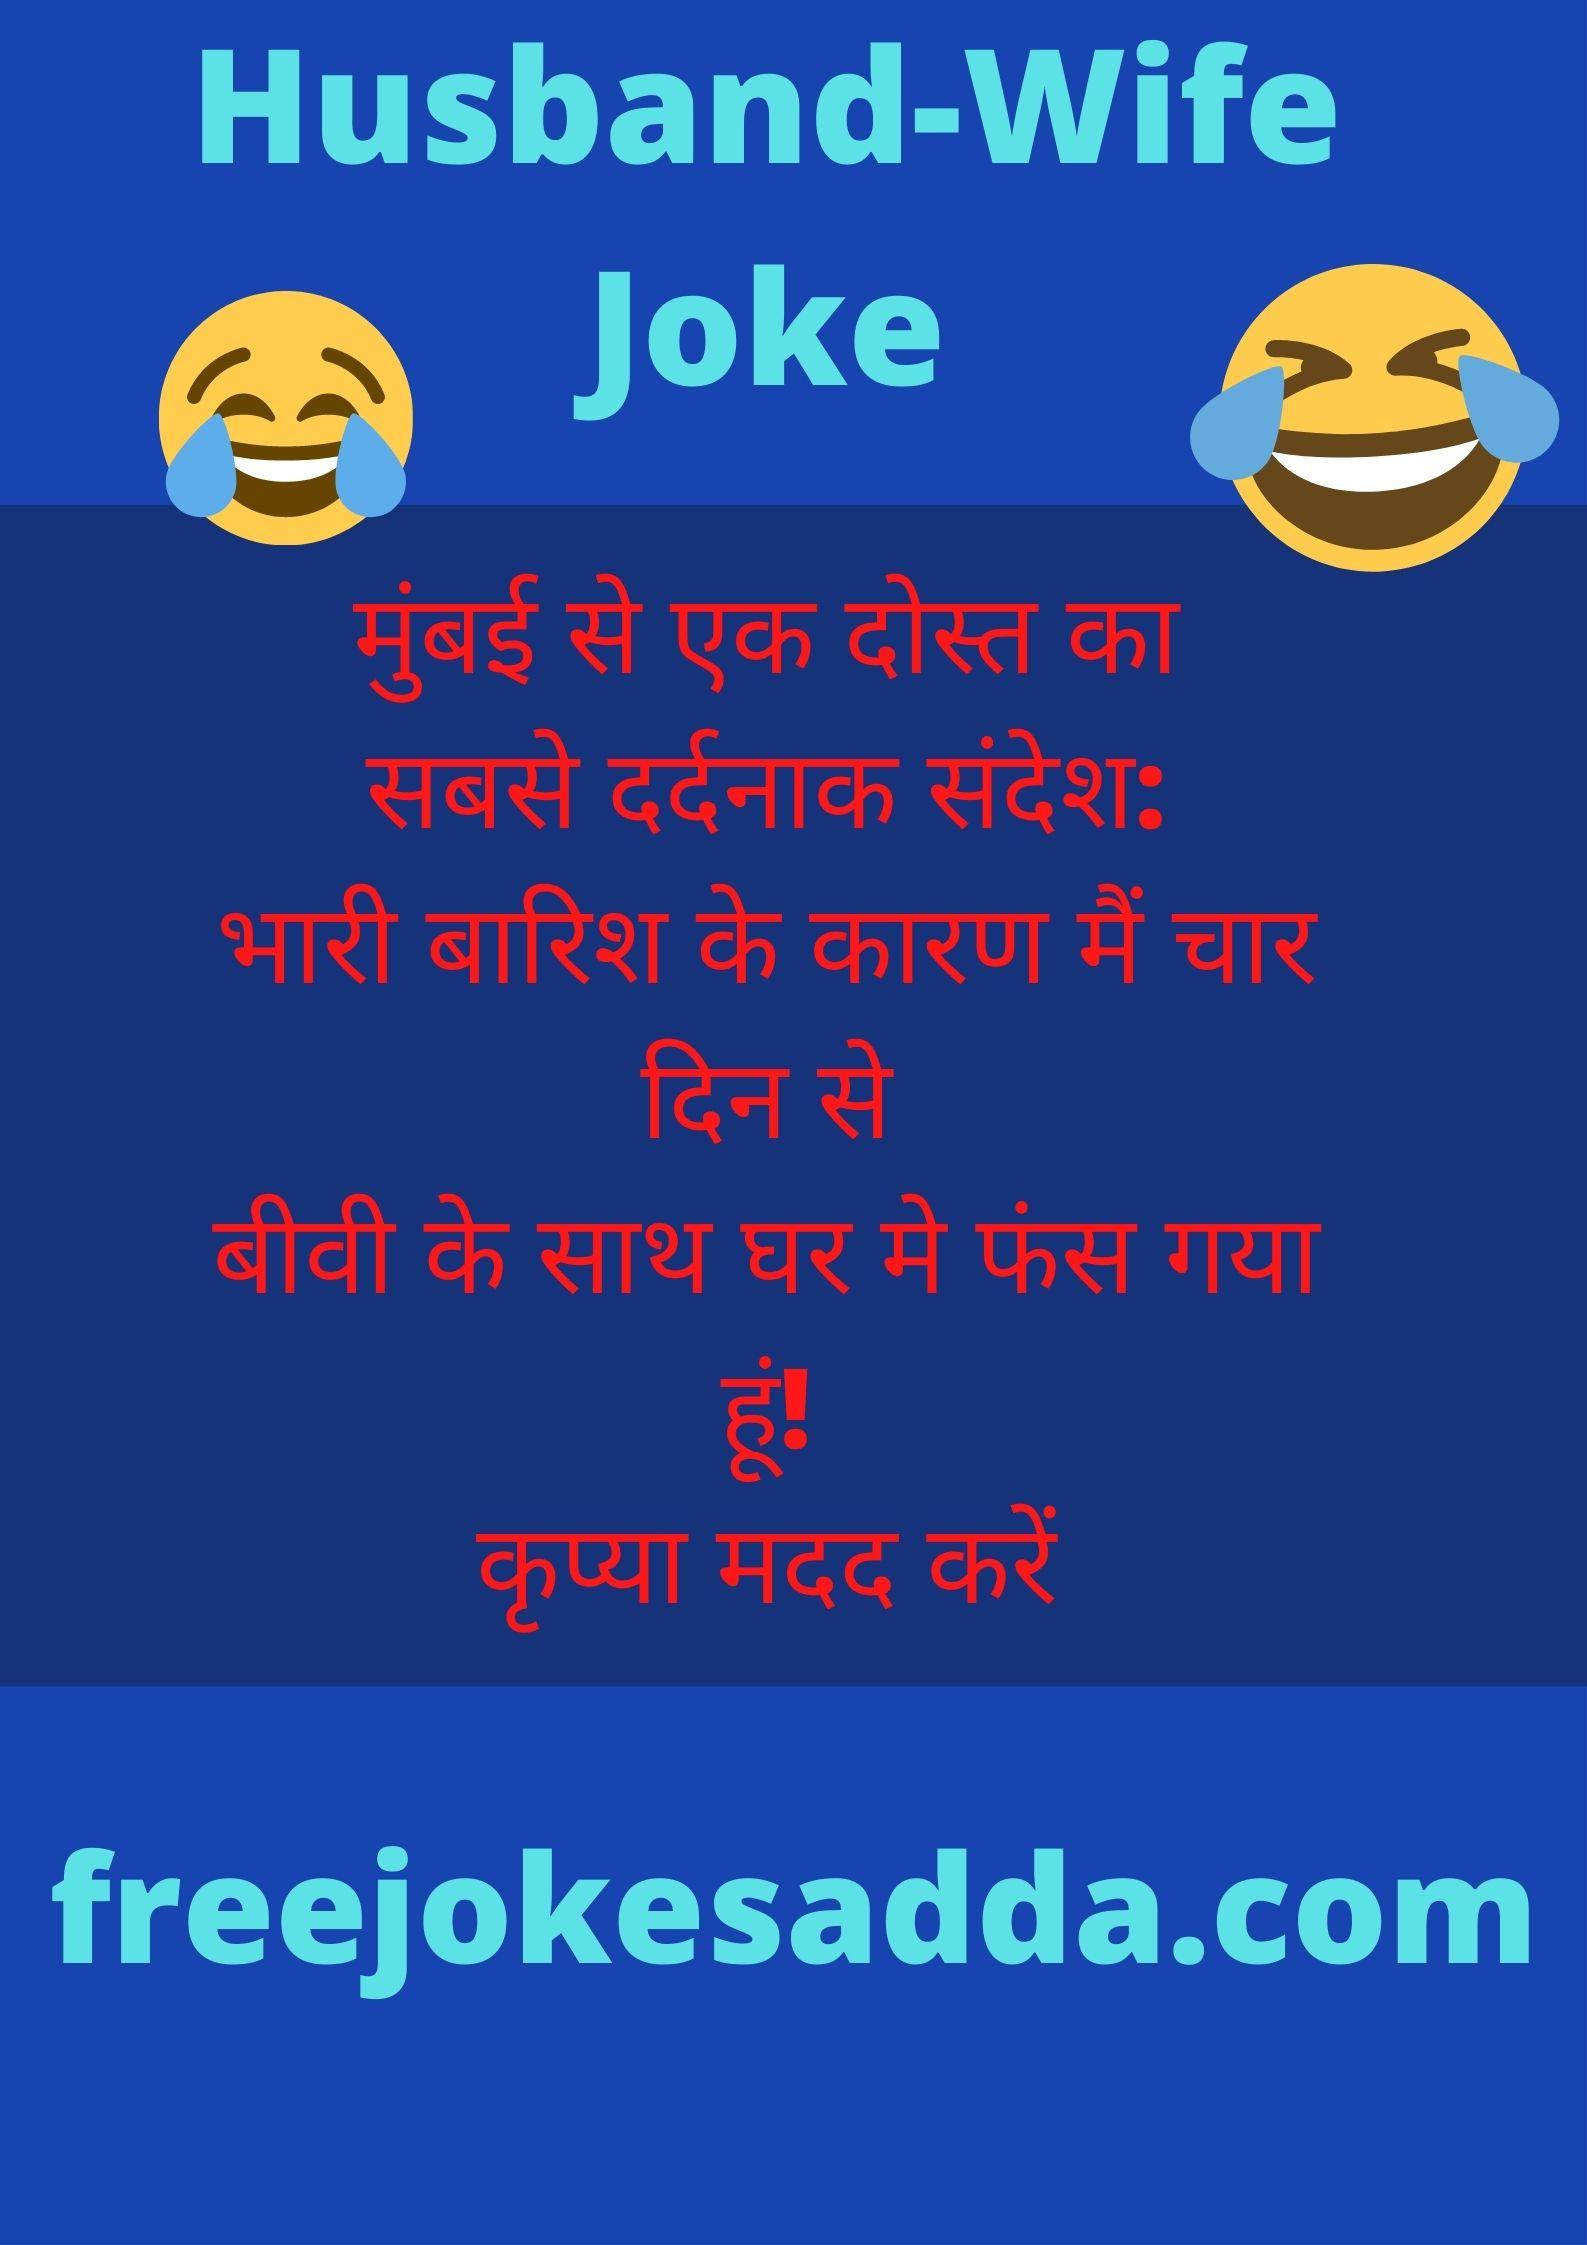 Husband-Wife Jokes